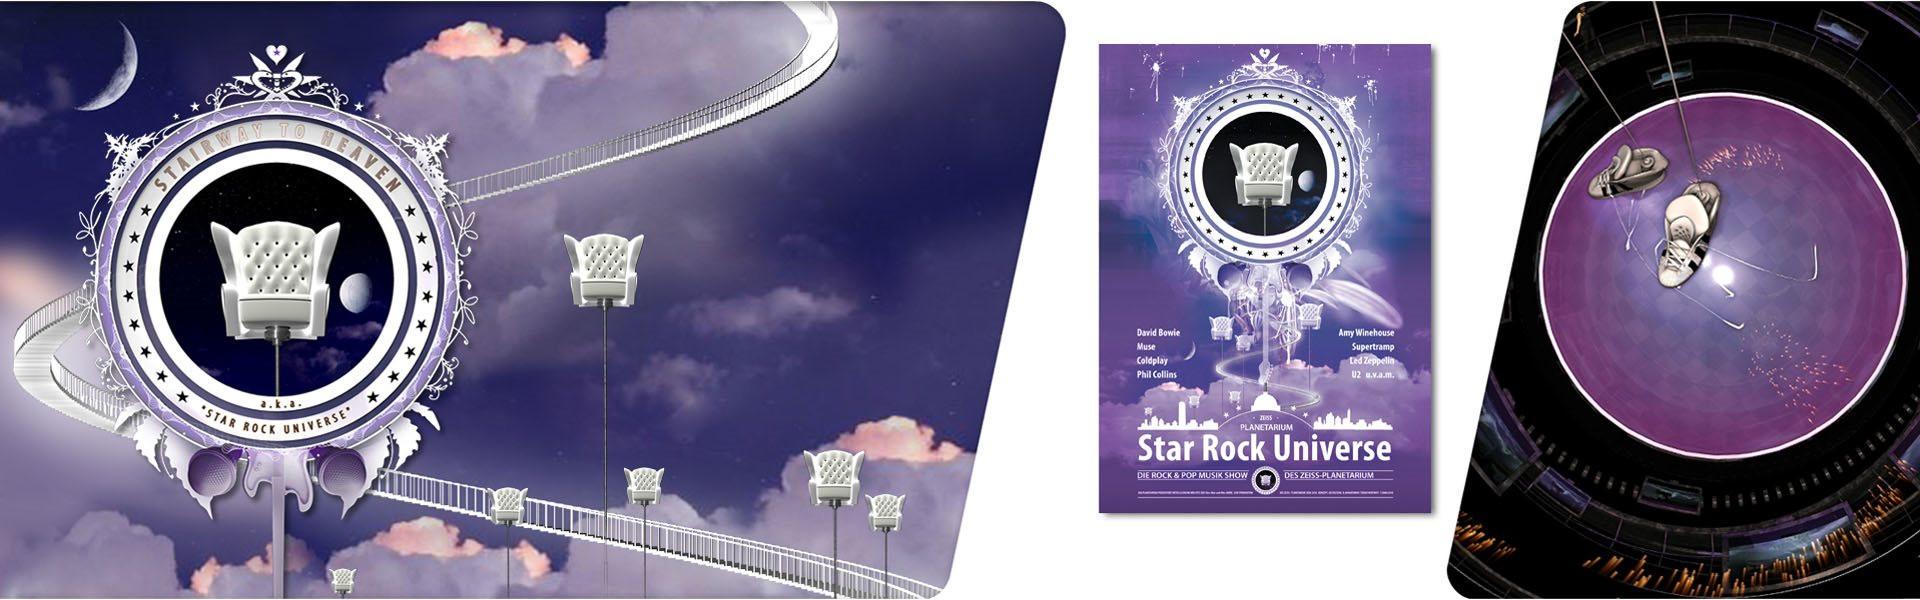 Star Rock Universe